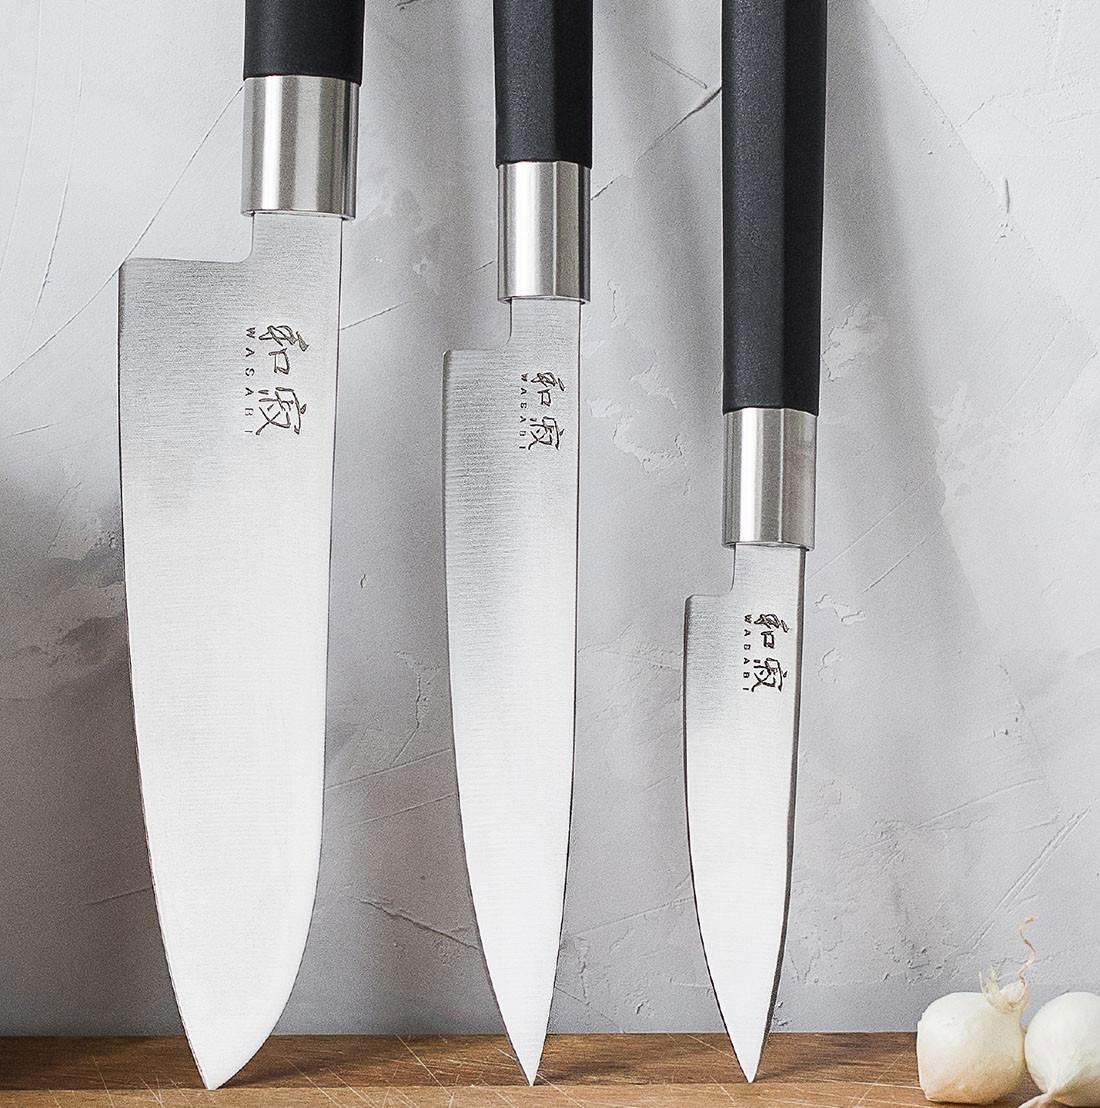 KAI Santoku Messer 16,5 cm Klinge + Allzweckmesser 15,0 cm/10,0 cm Klingenlänge